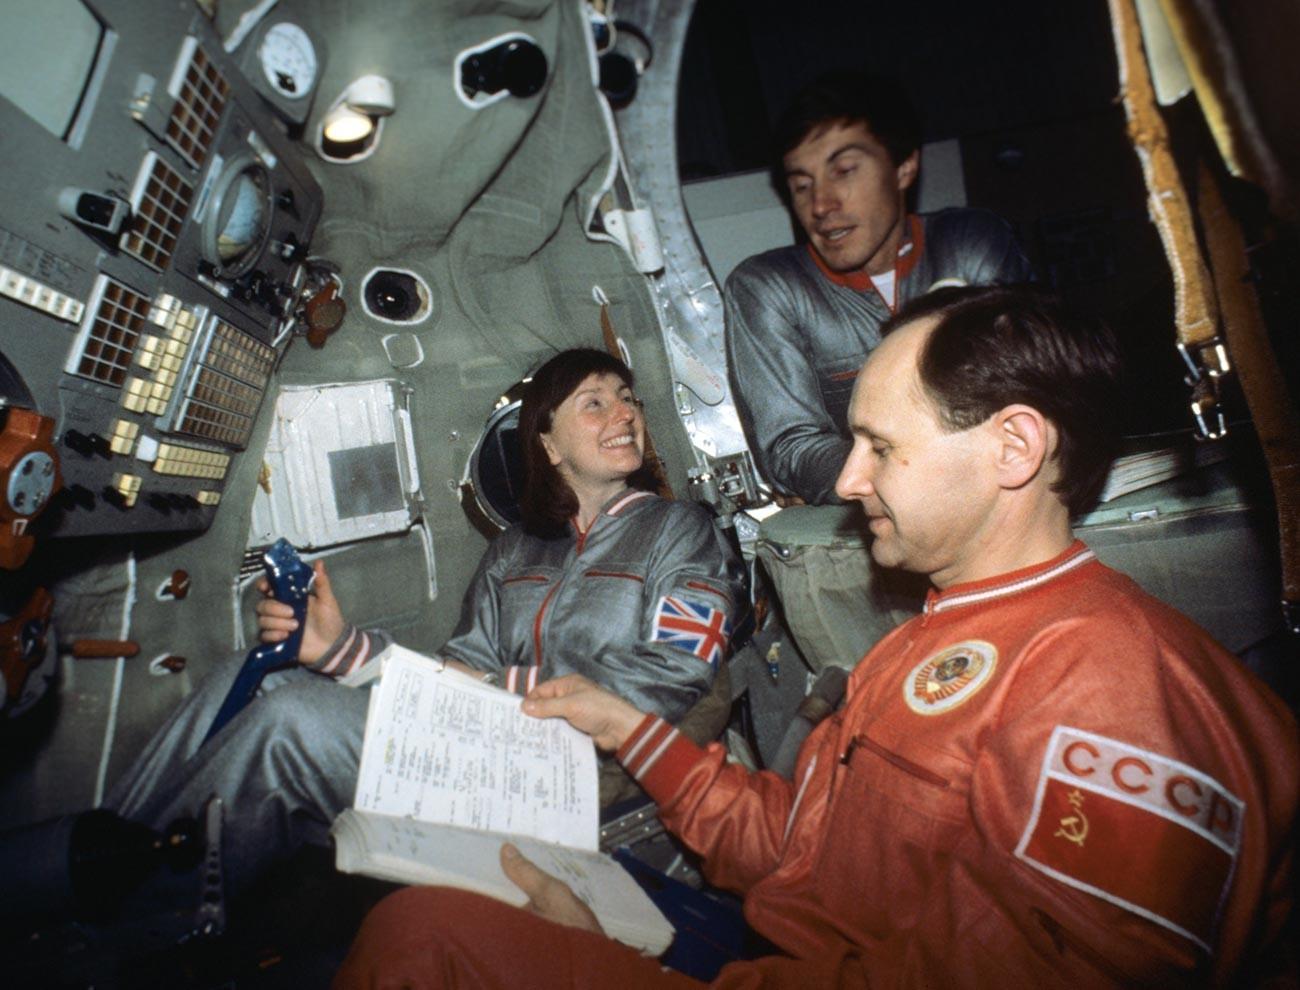 La tripulación espacial soviético-británica: Helen Sharman, Serguéi Krikalev y Anatoli Artsebarski.